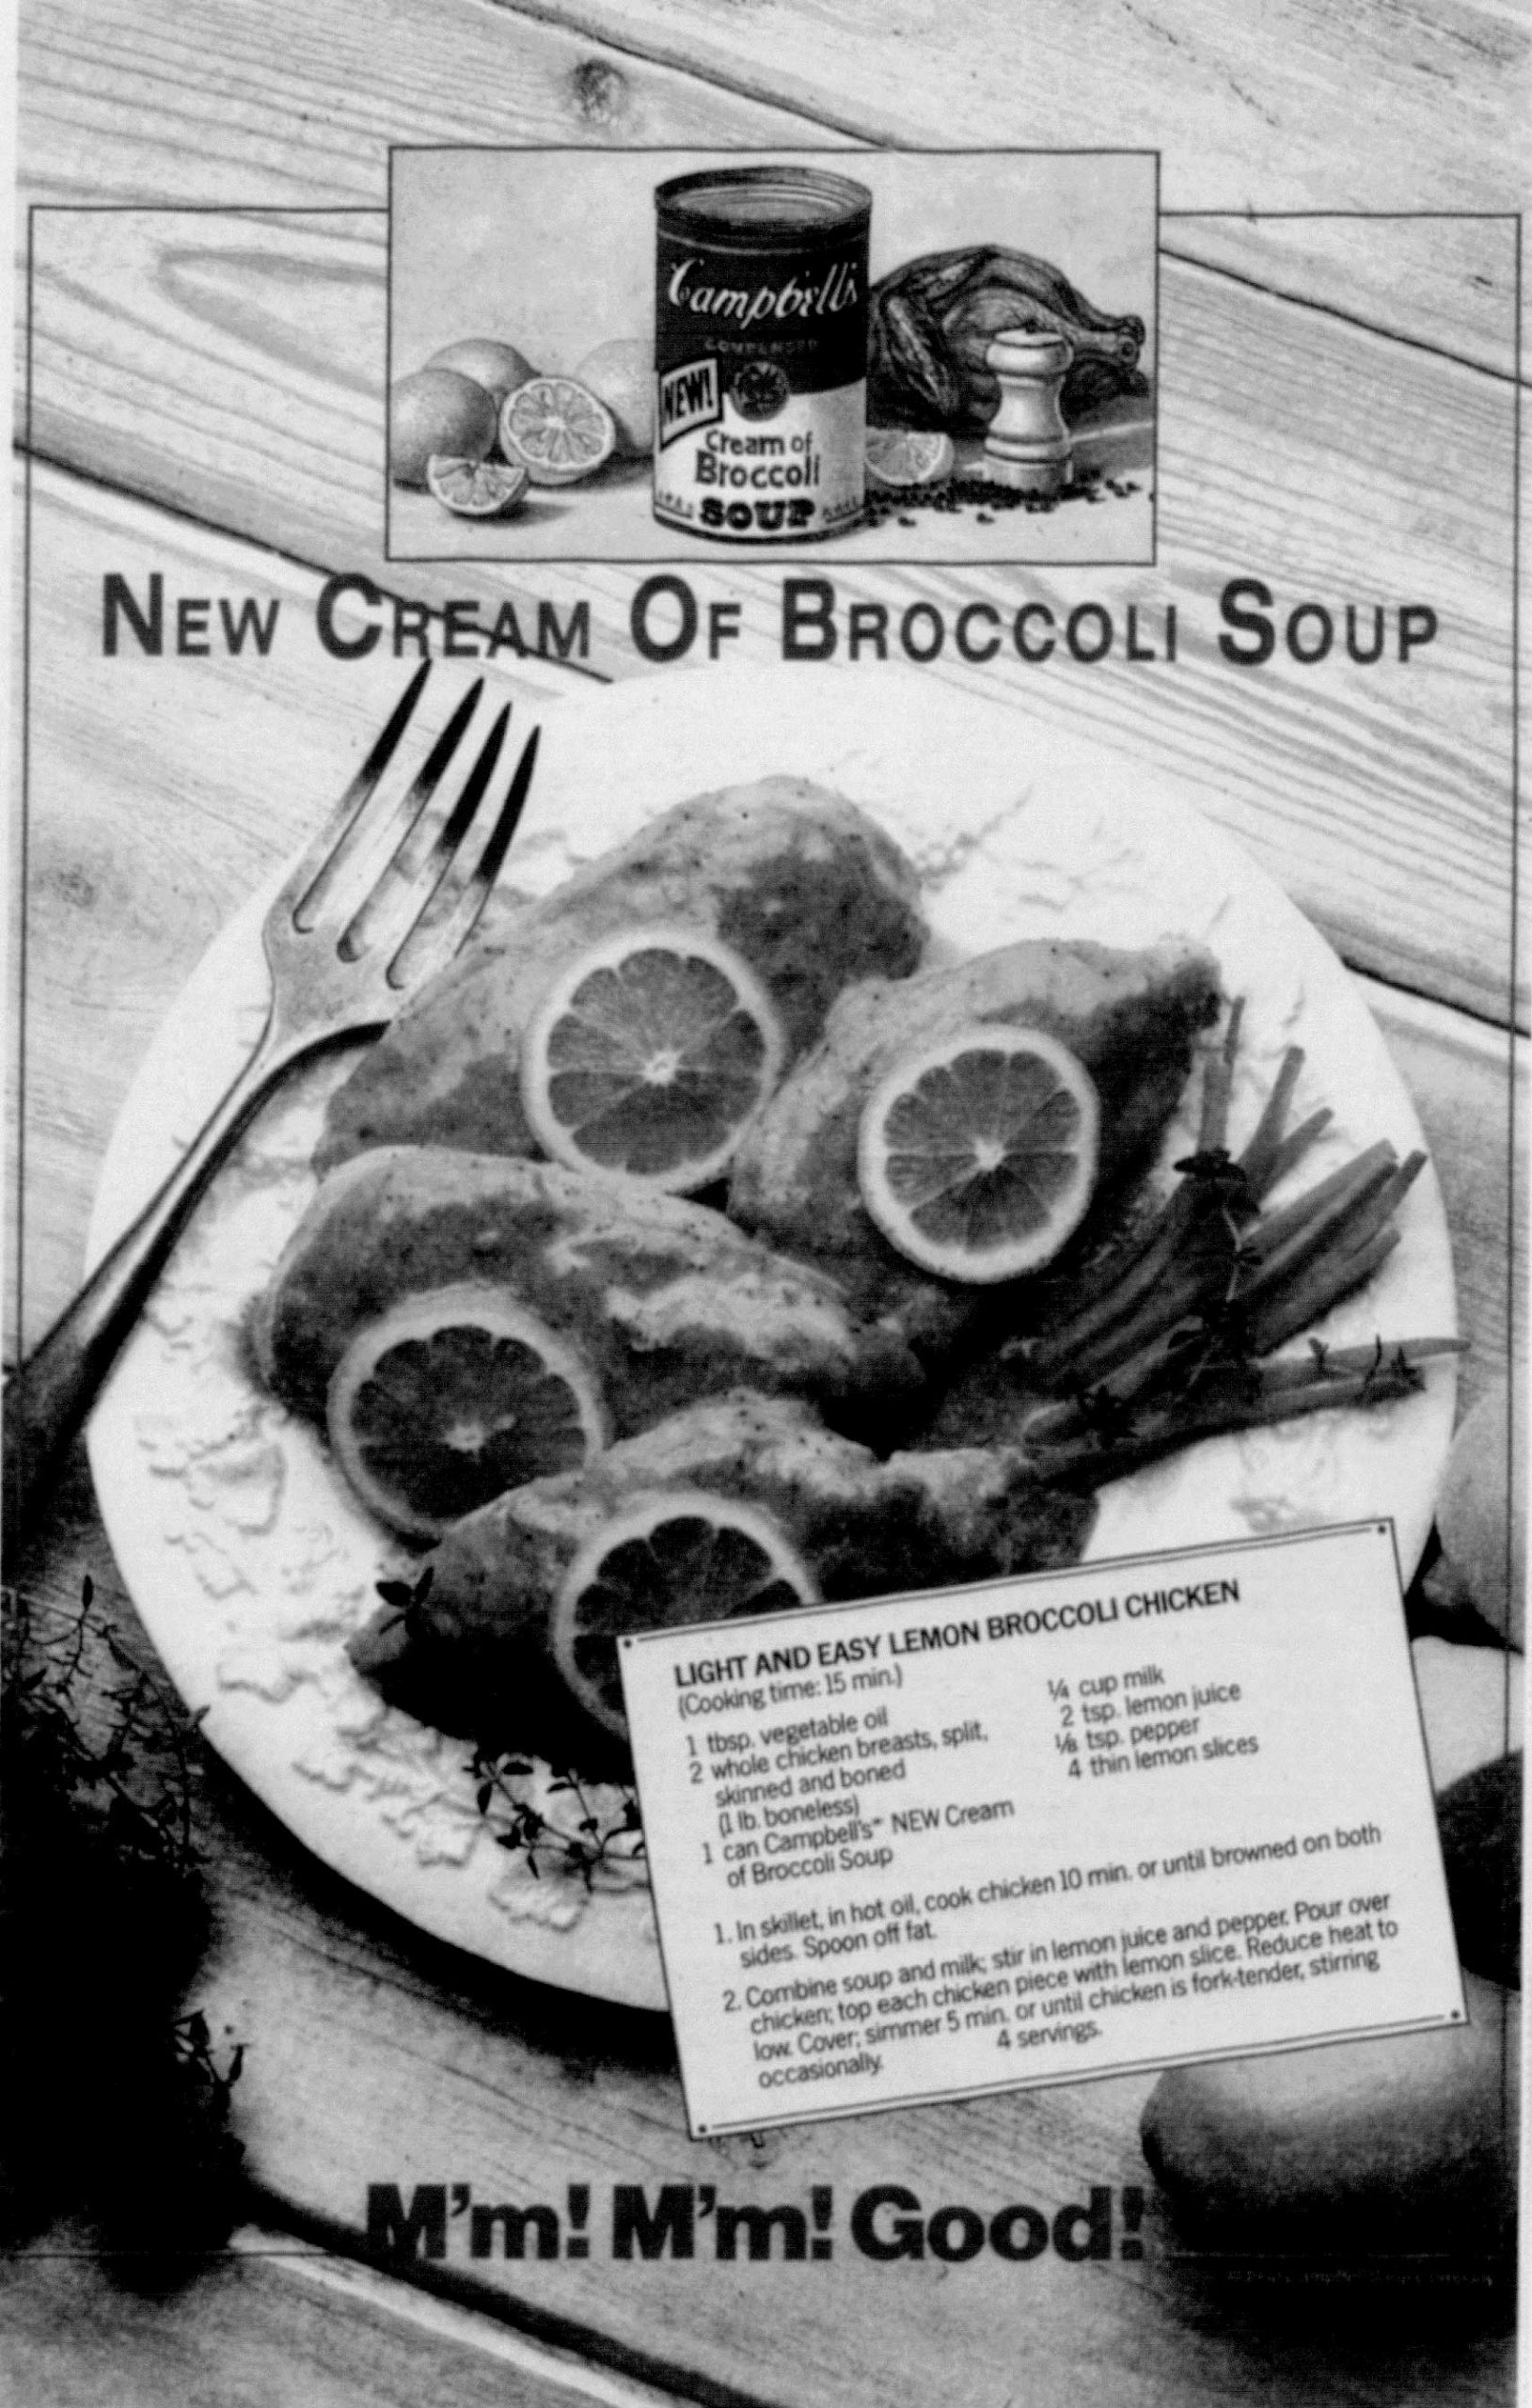 November 1990 advertisement cream of broccoli soup